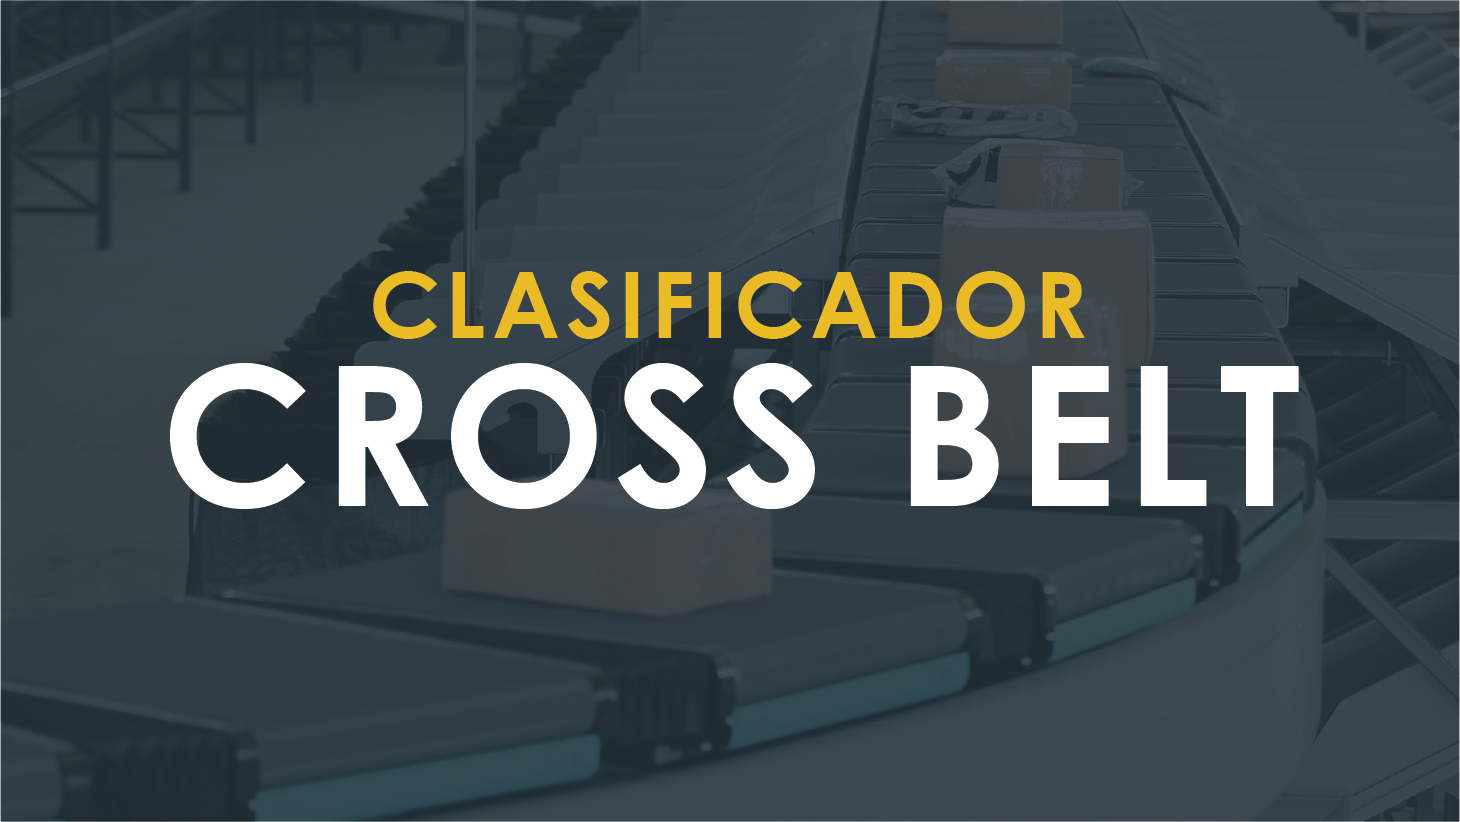 CROSSBELT-icon-ES_1